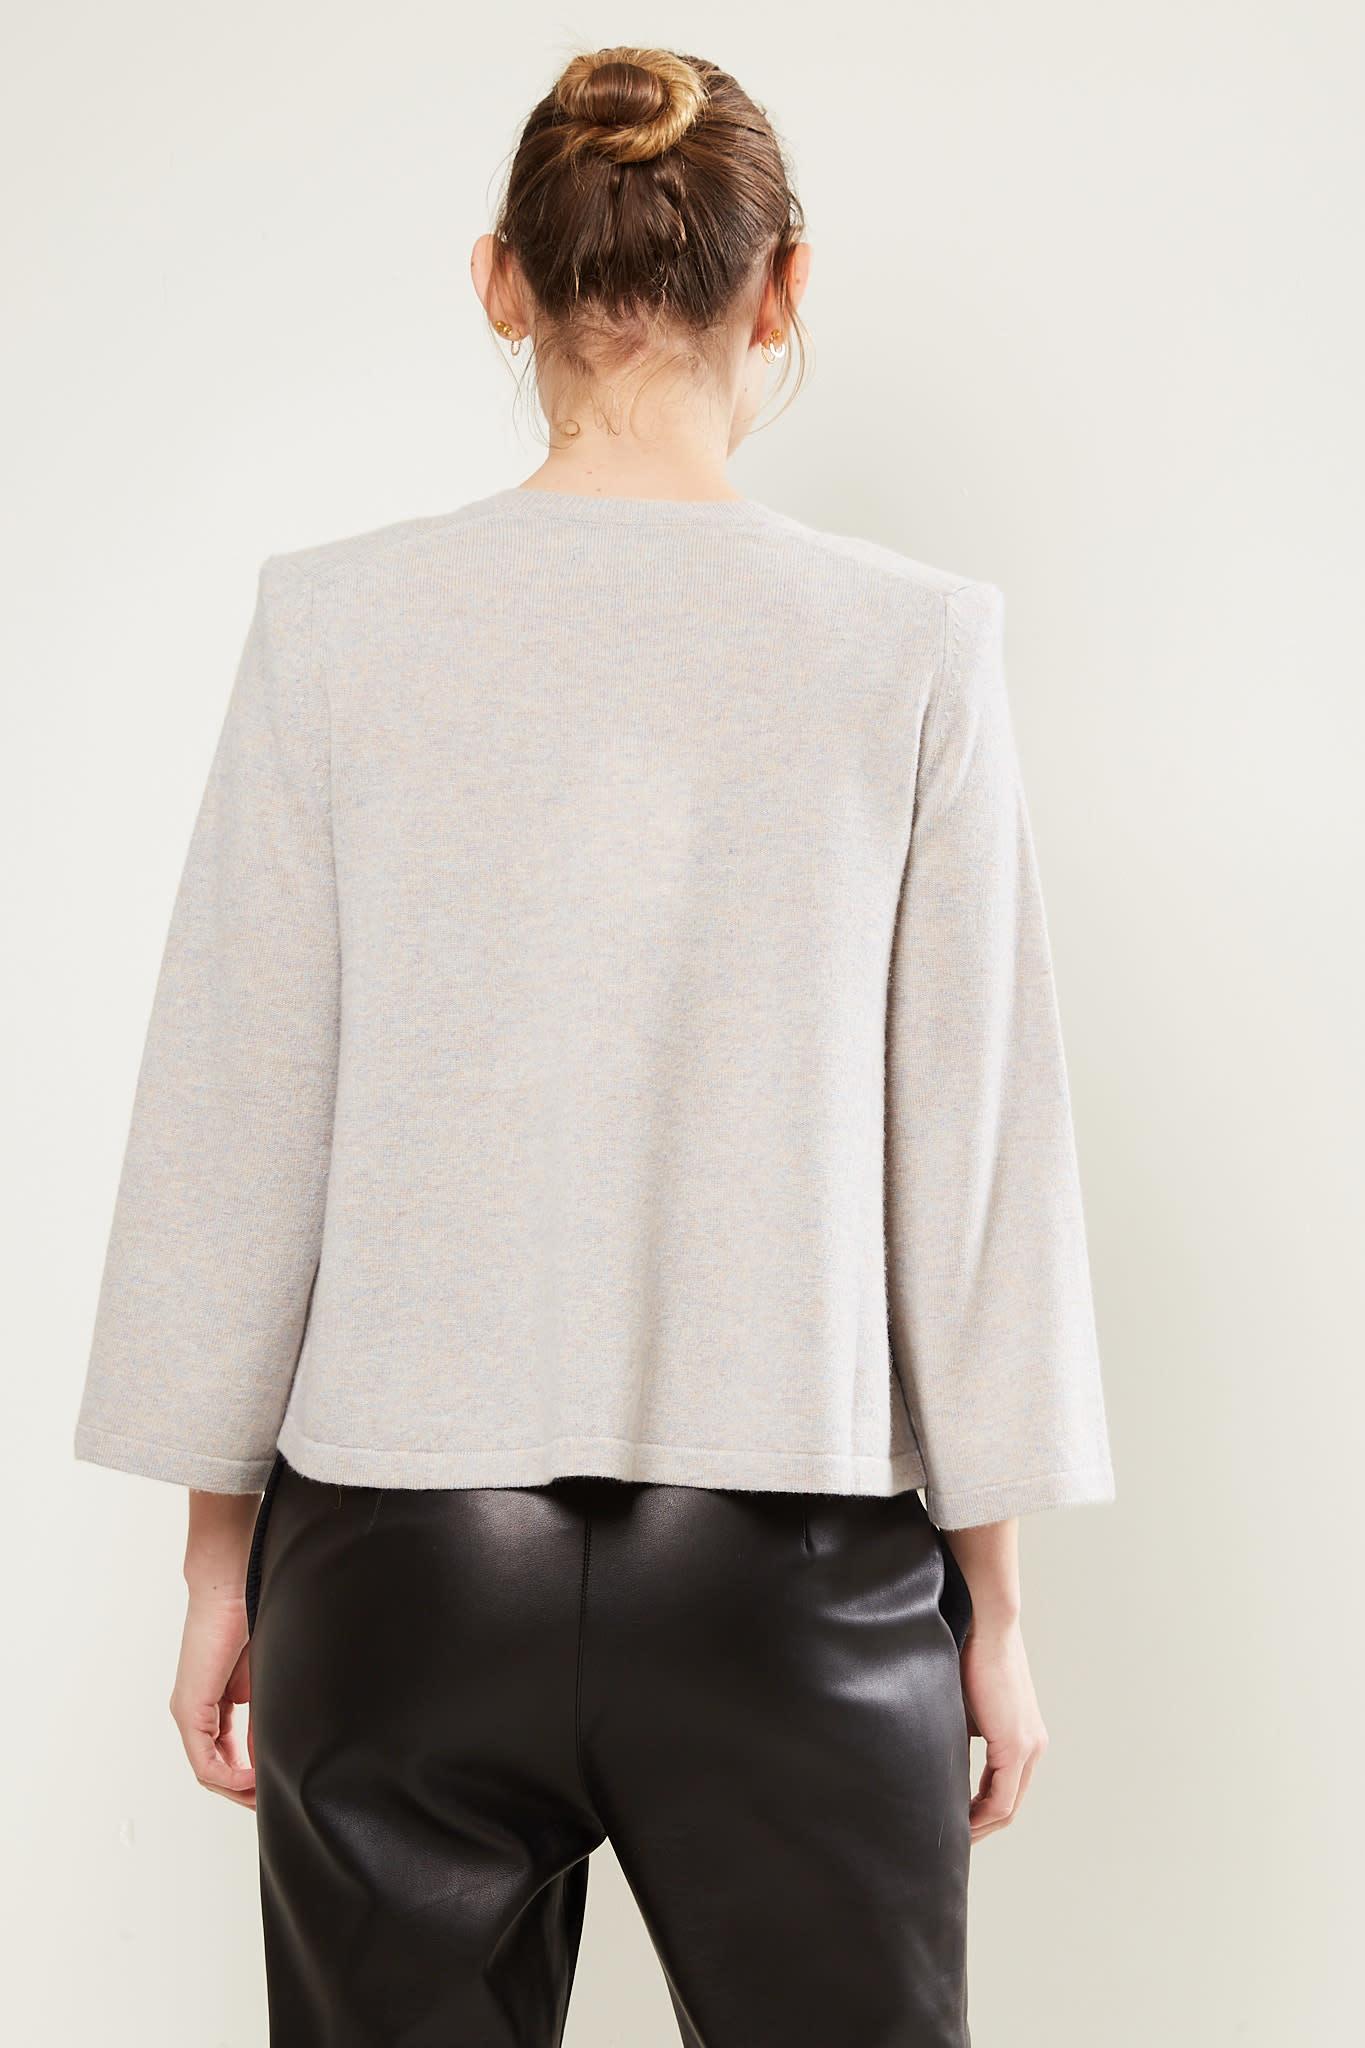 Isabel Marant - Augustine cashmere sweater